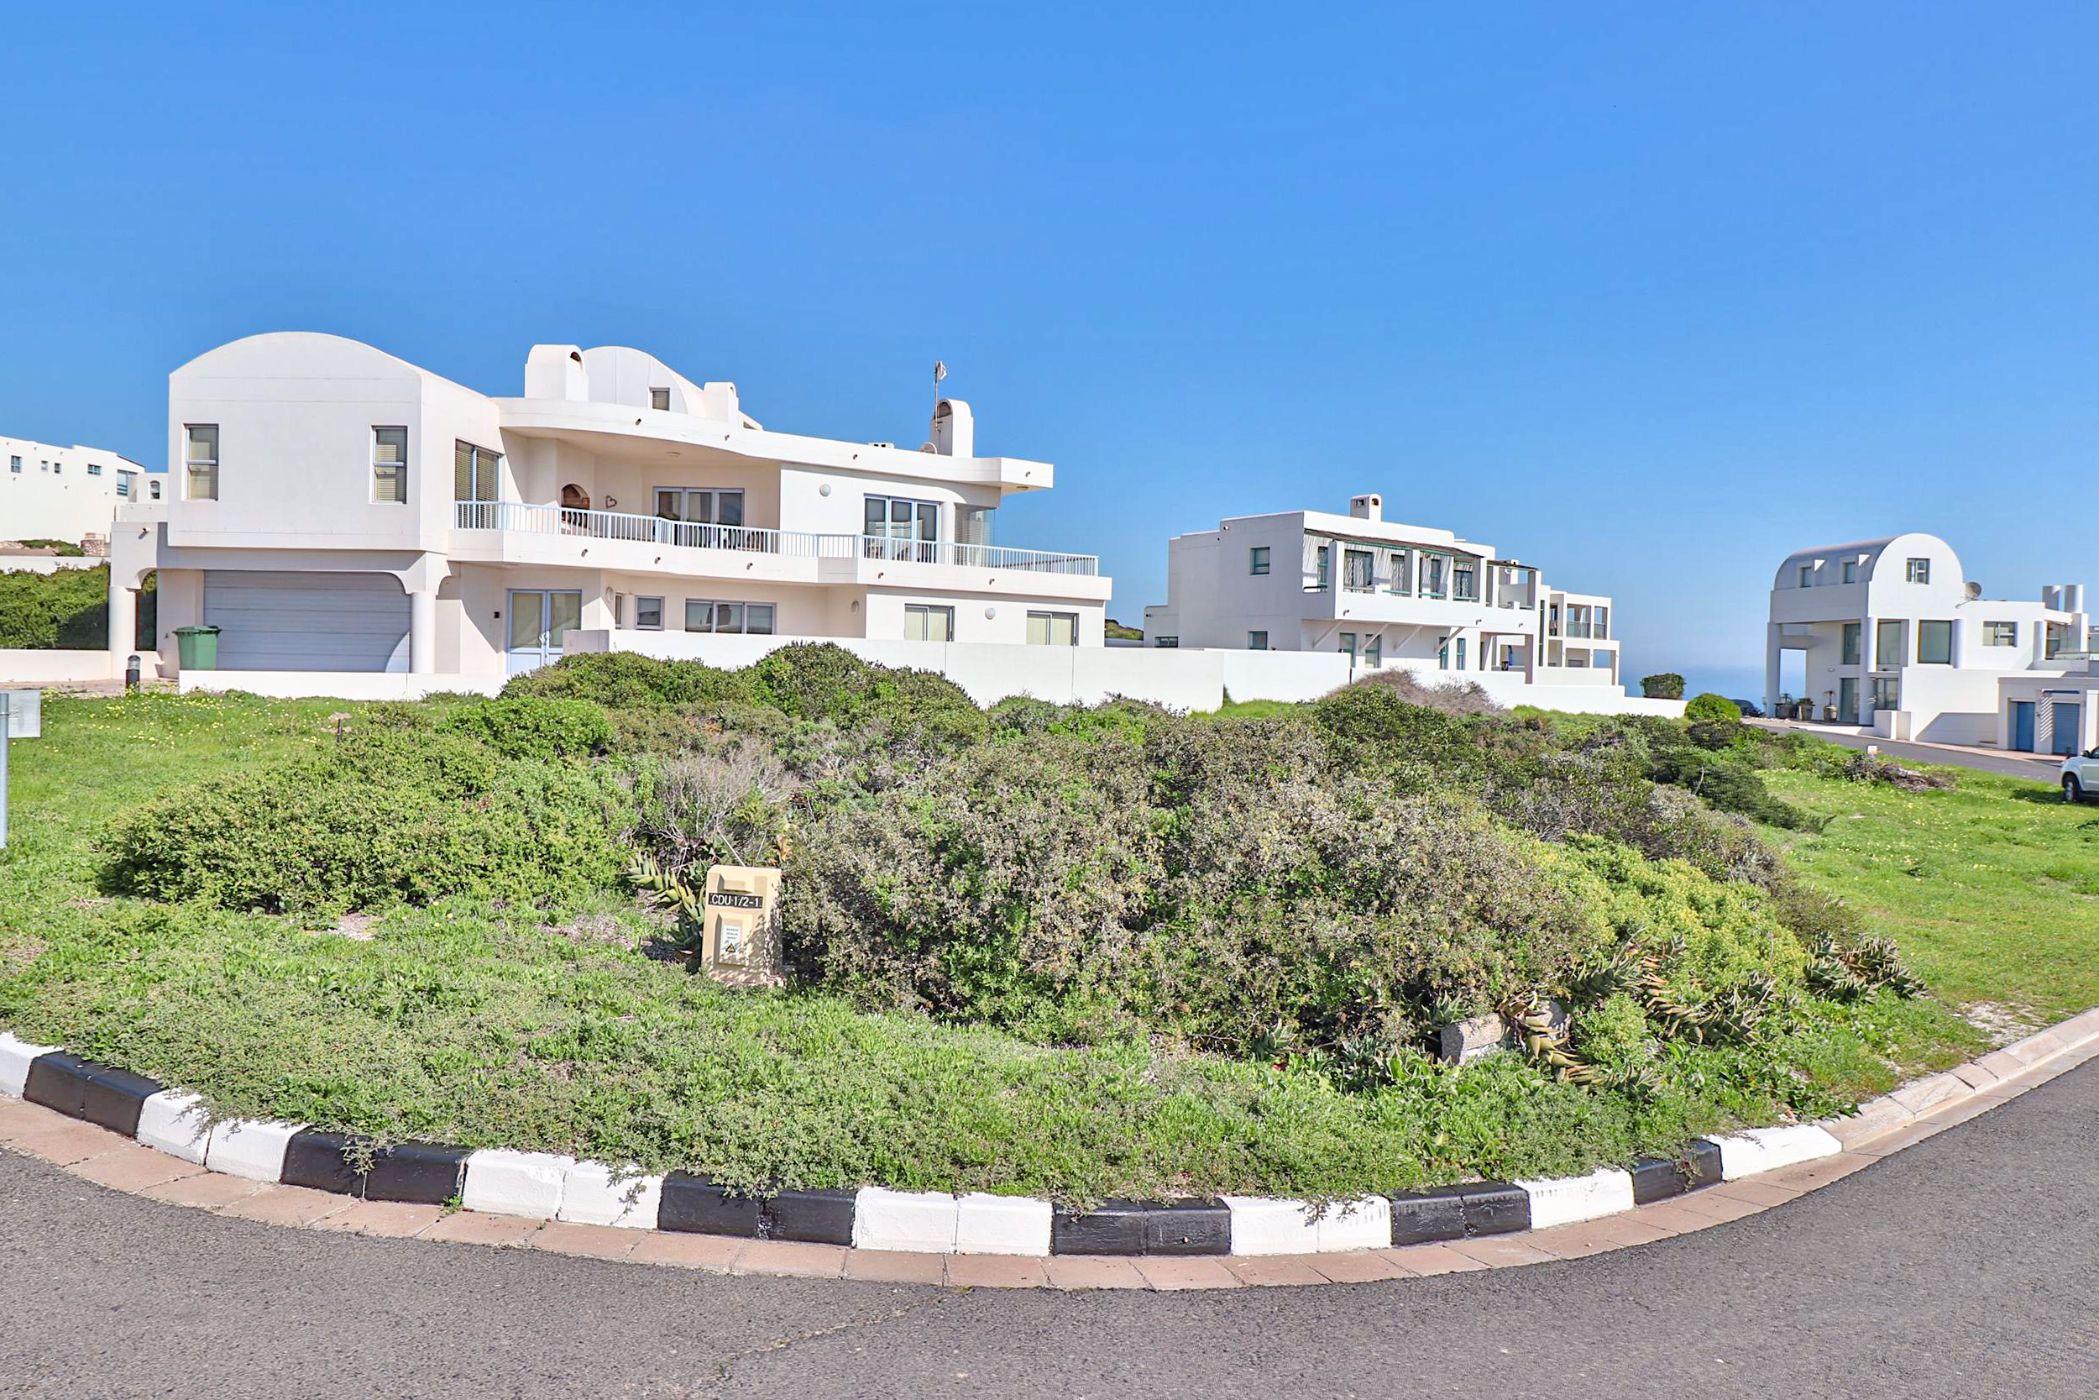 430 m² vacant land for sale in Paradise Beach (Langebaan)